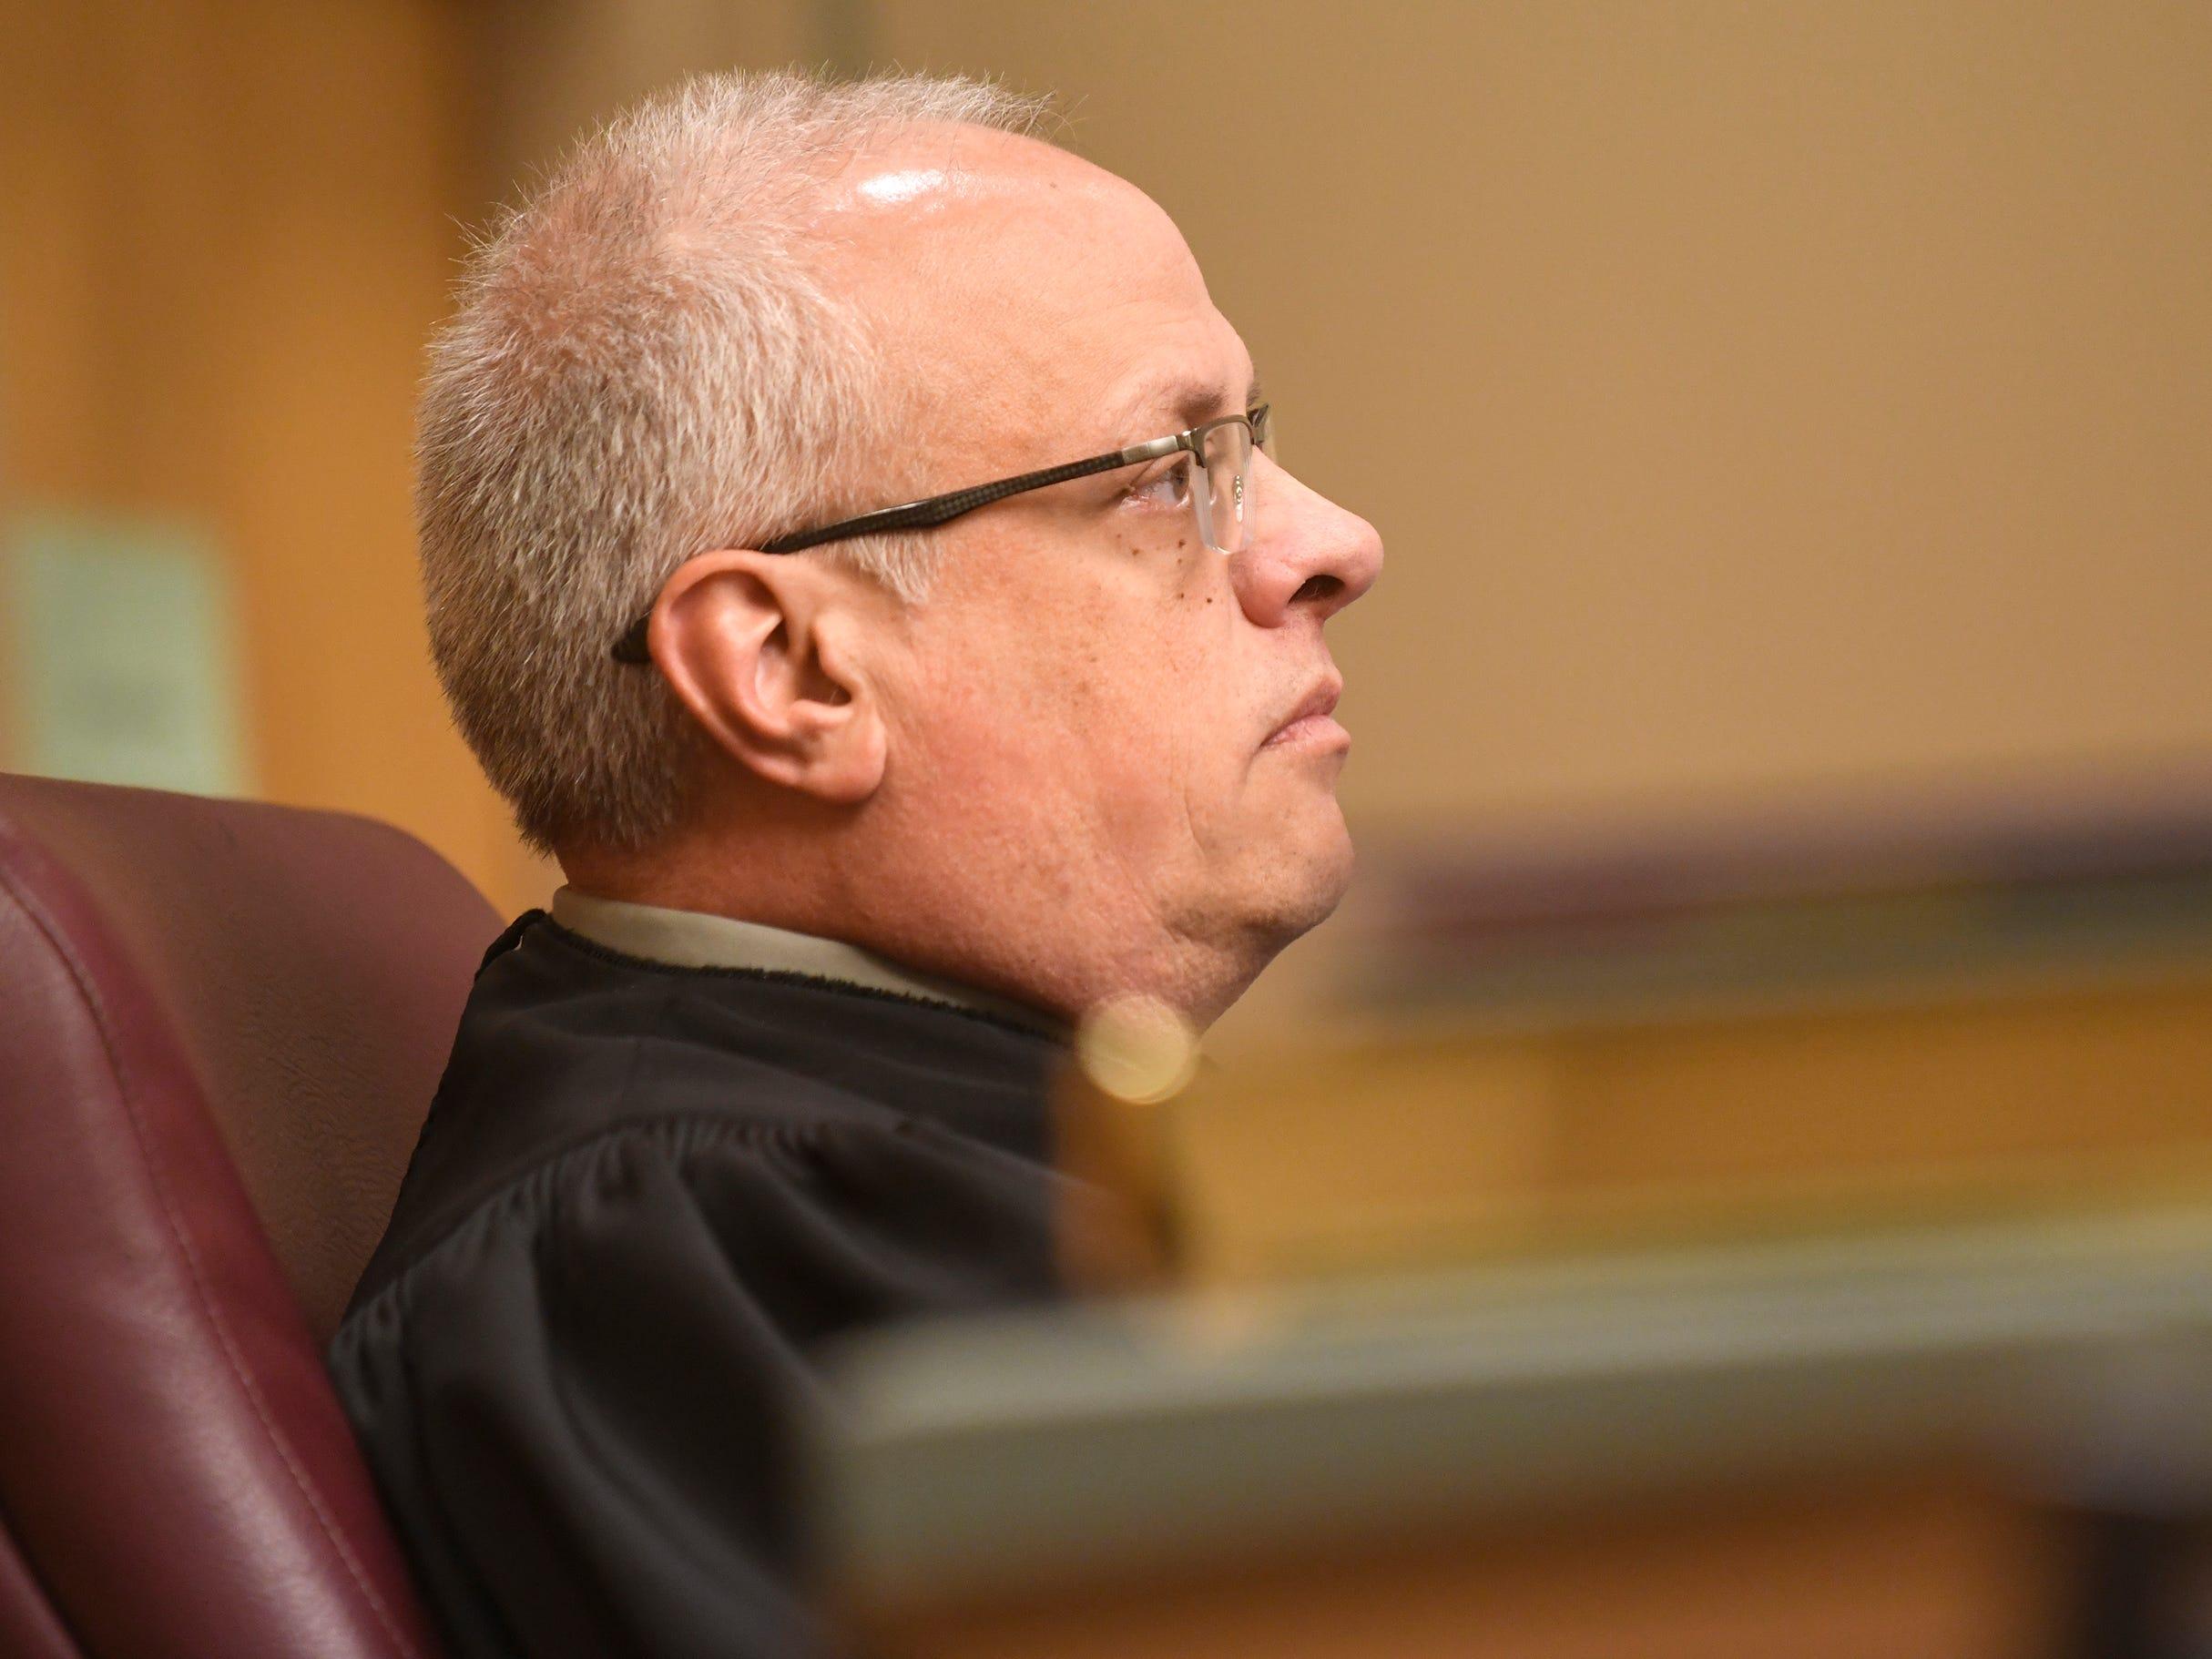 Judge Cristen D'Arrigo listens to Assistant Prosecutor Meghan Price during Leonard J. Zawojski's hearing in Cumberland County Superior Court on Thursday, April 18, 2019.